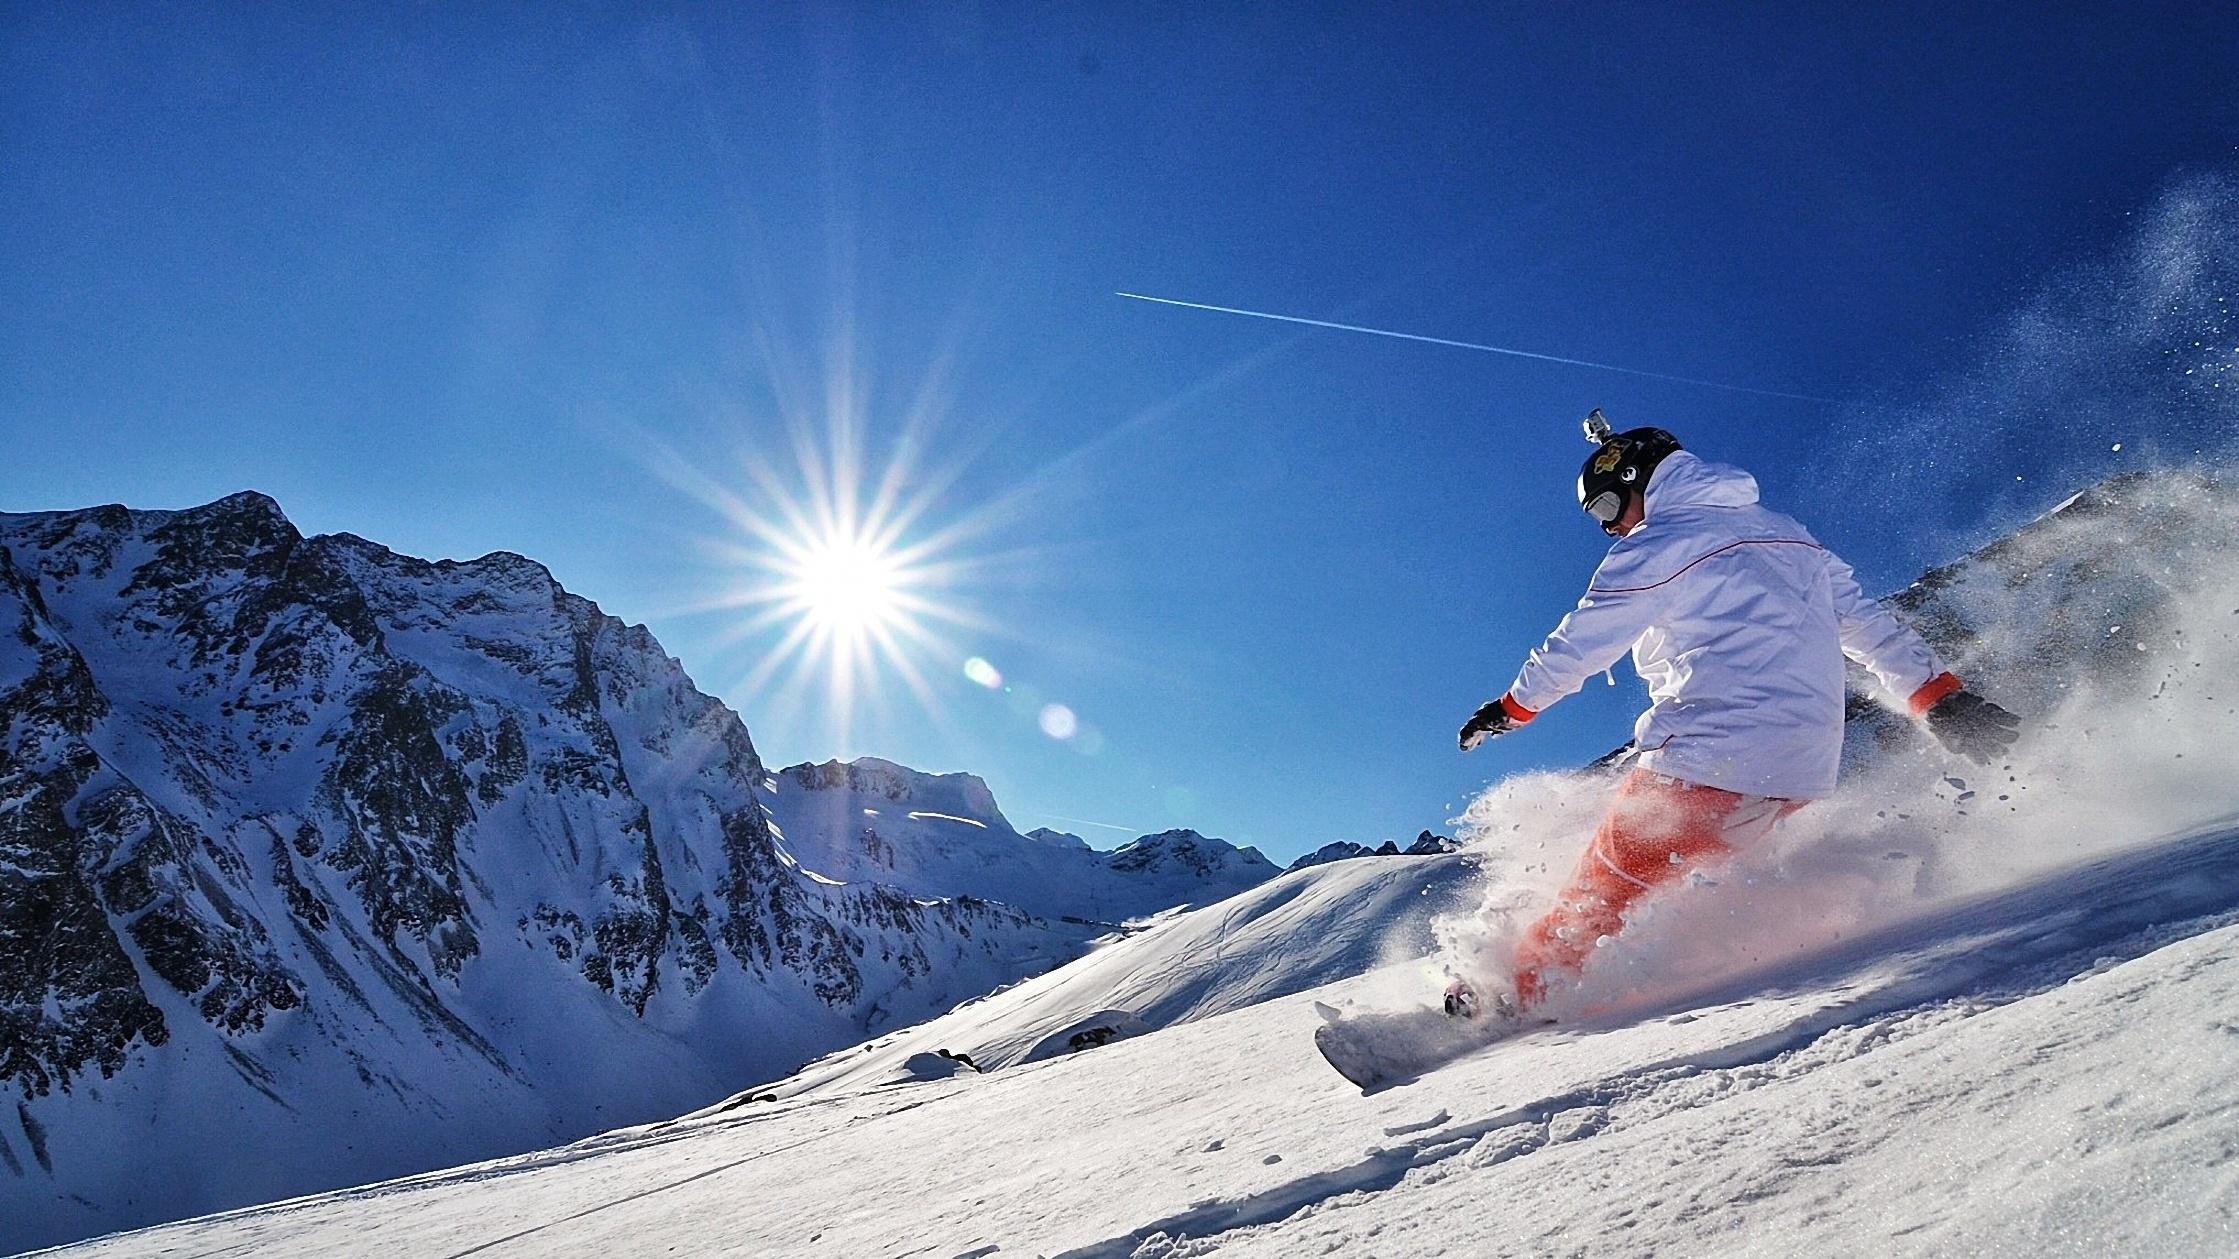 Snowboarding sun mountains snowboard snow wallpaper ...